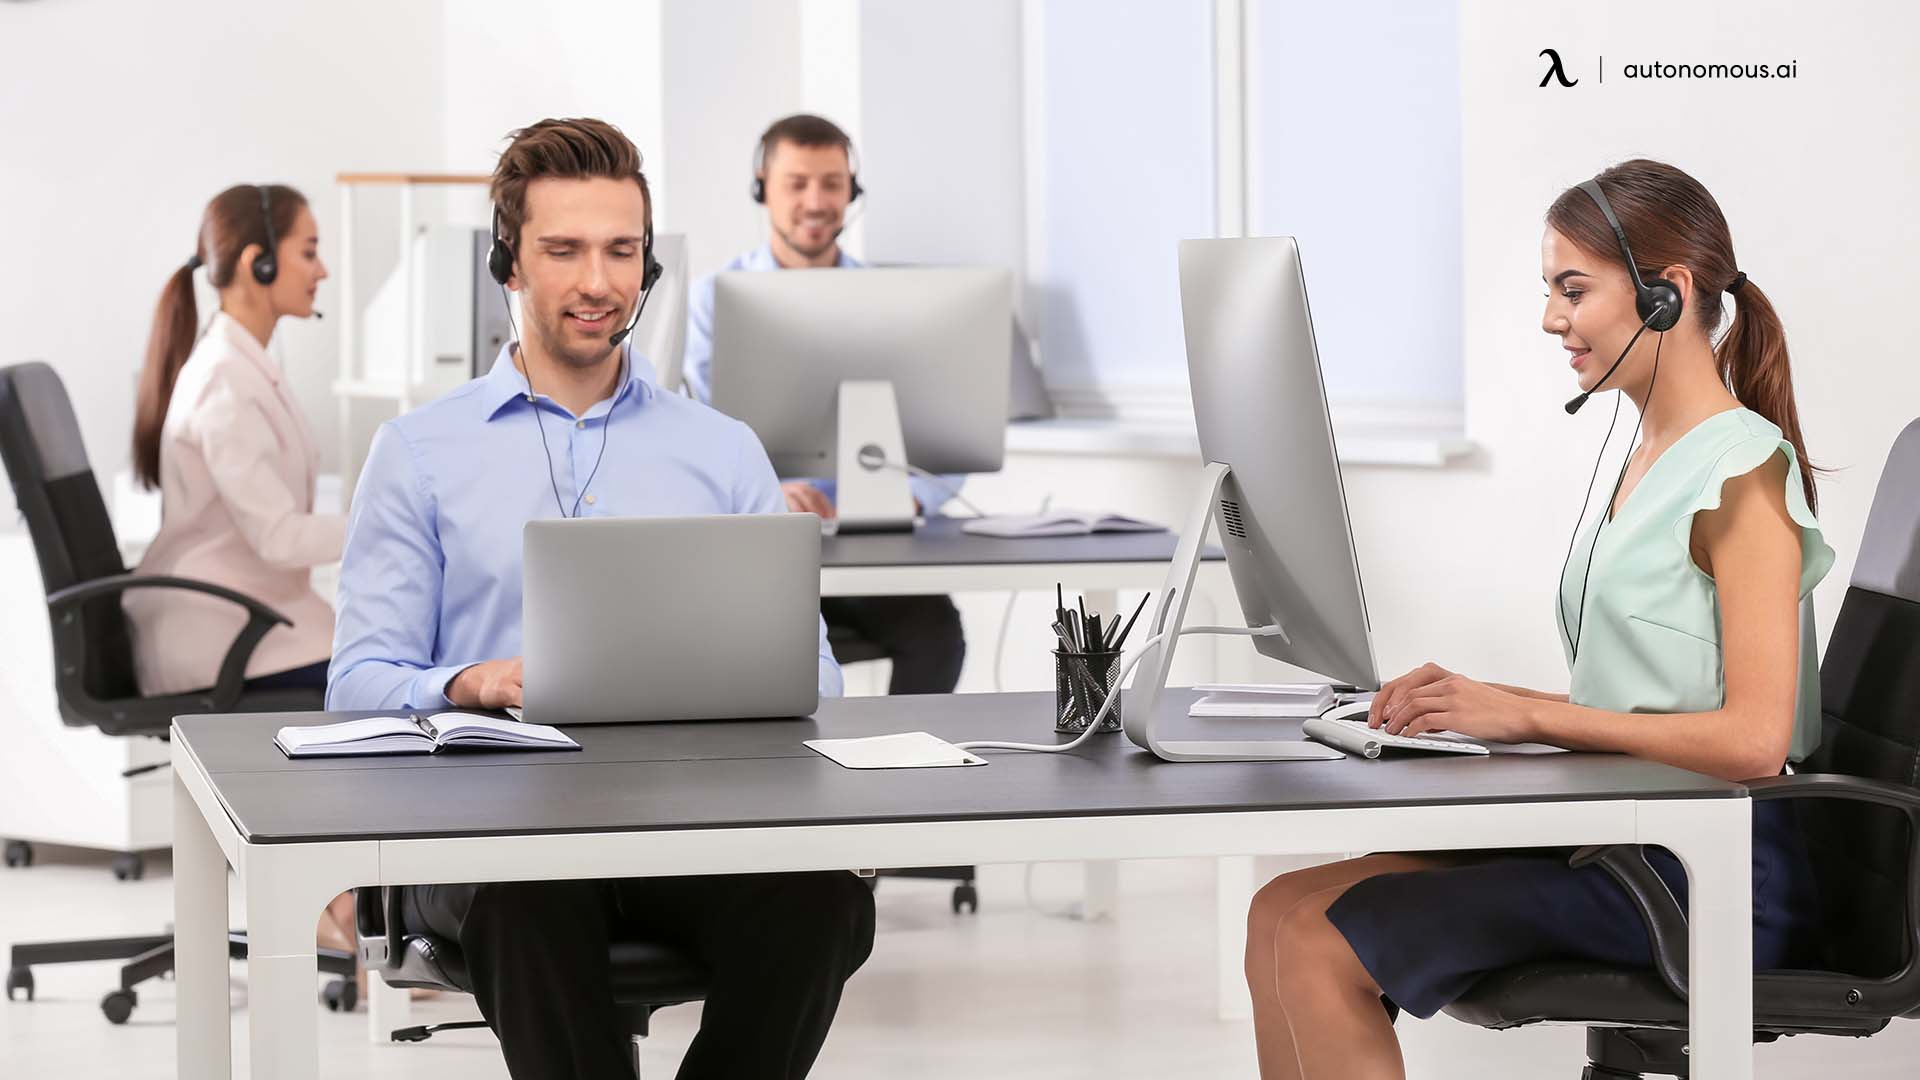 Better networking